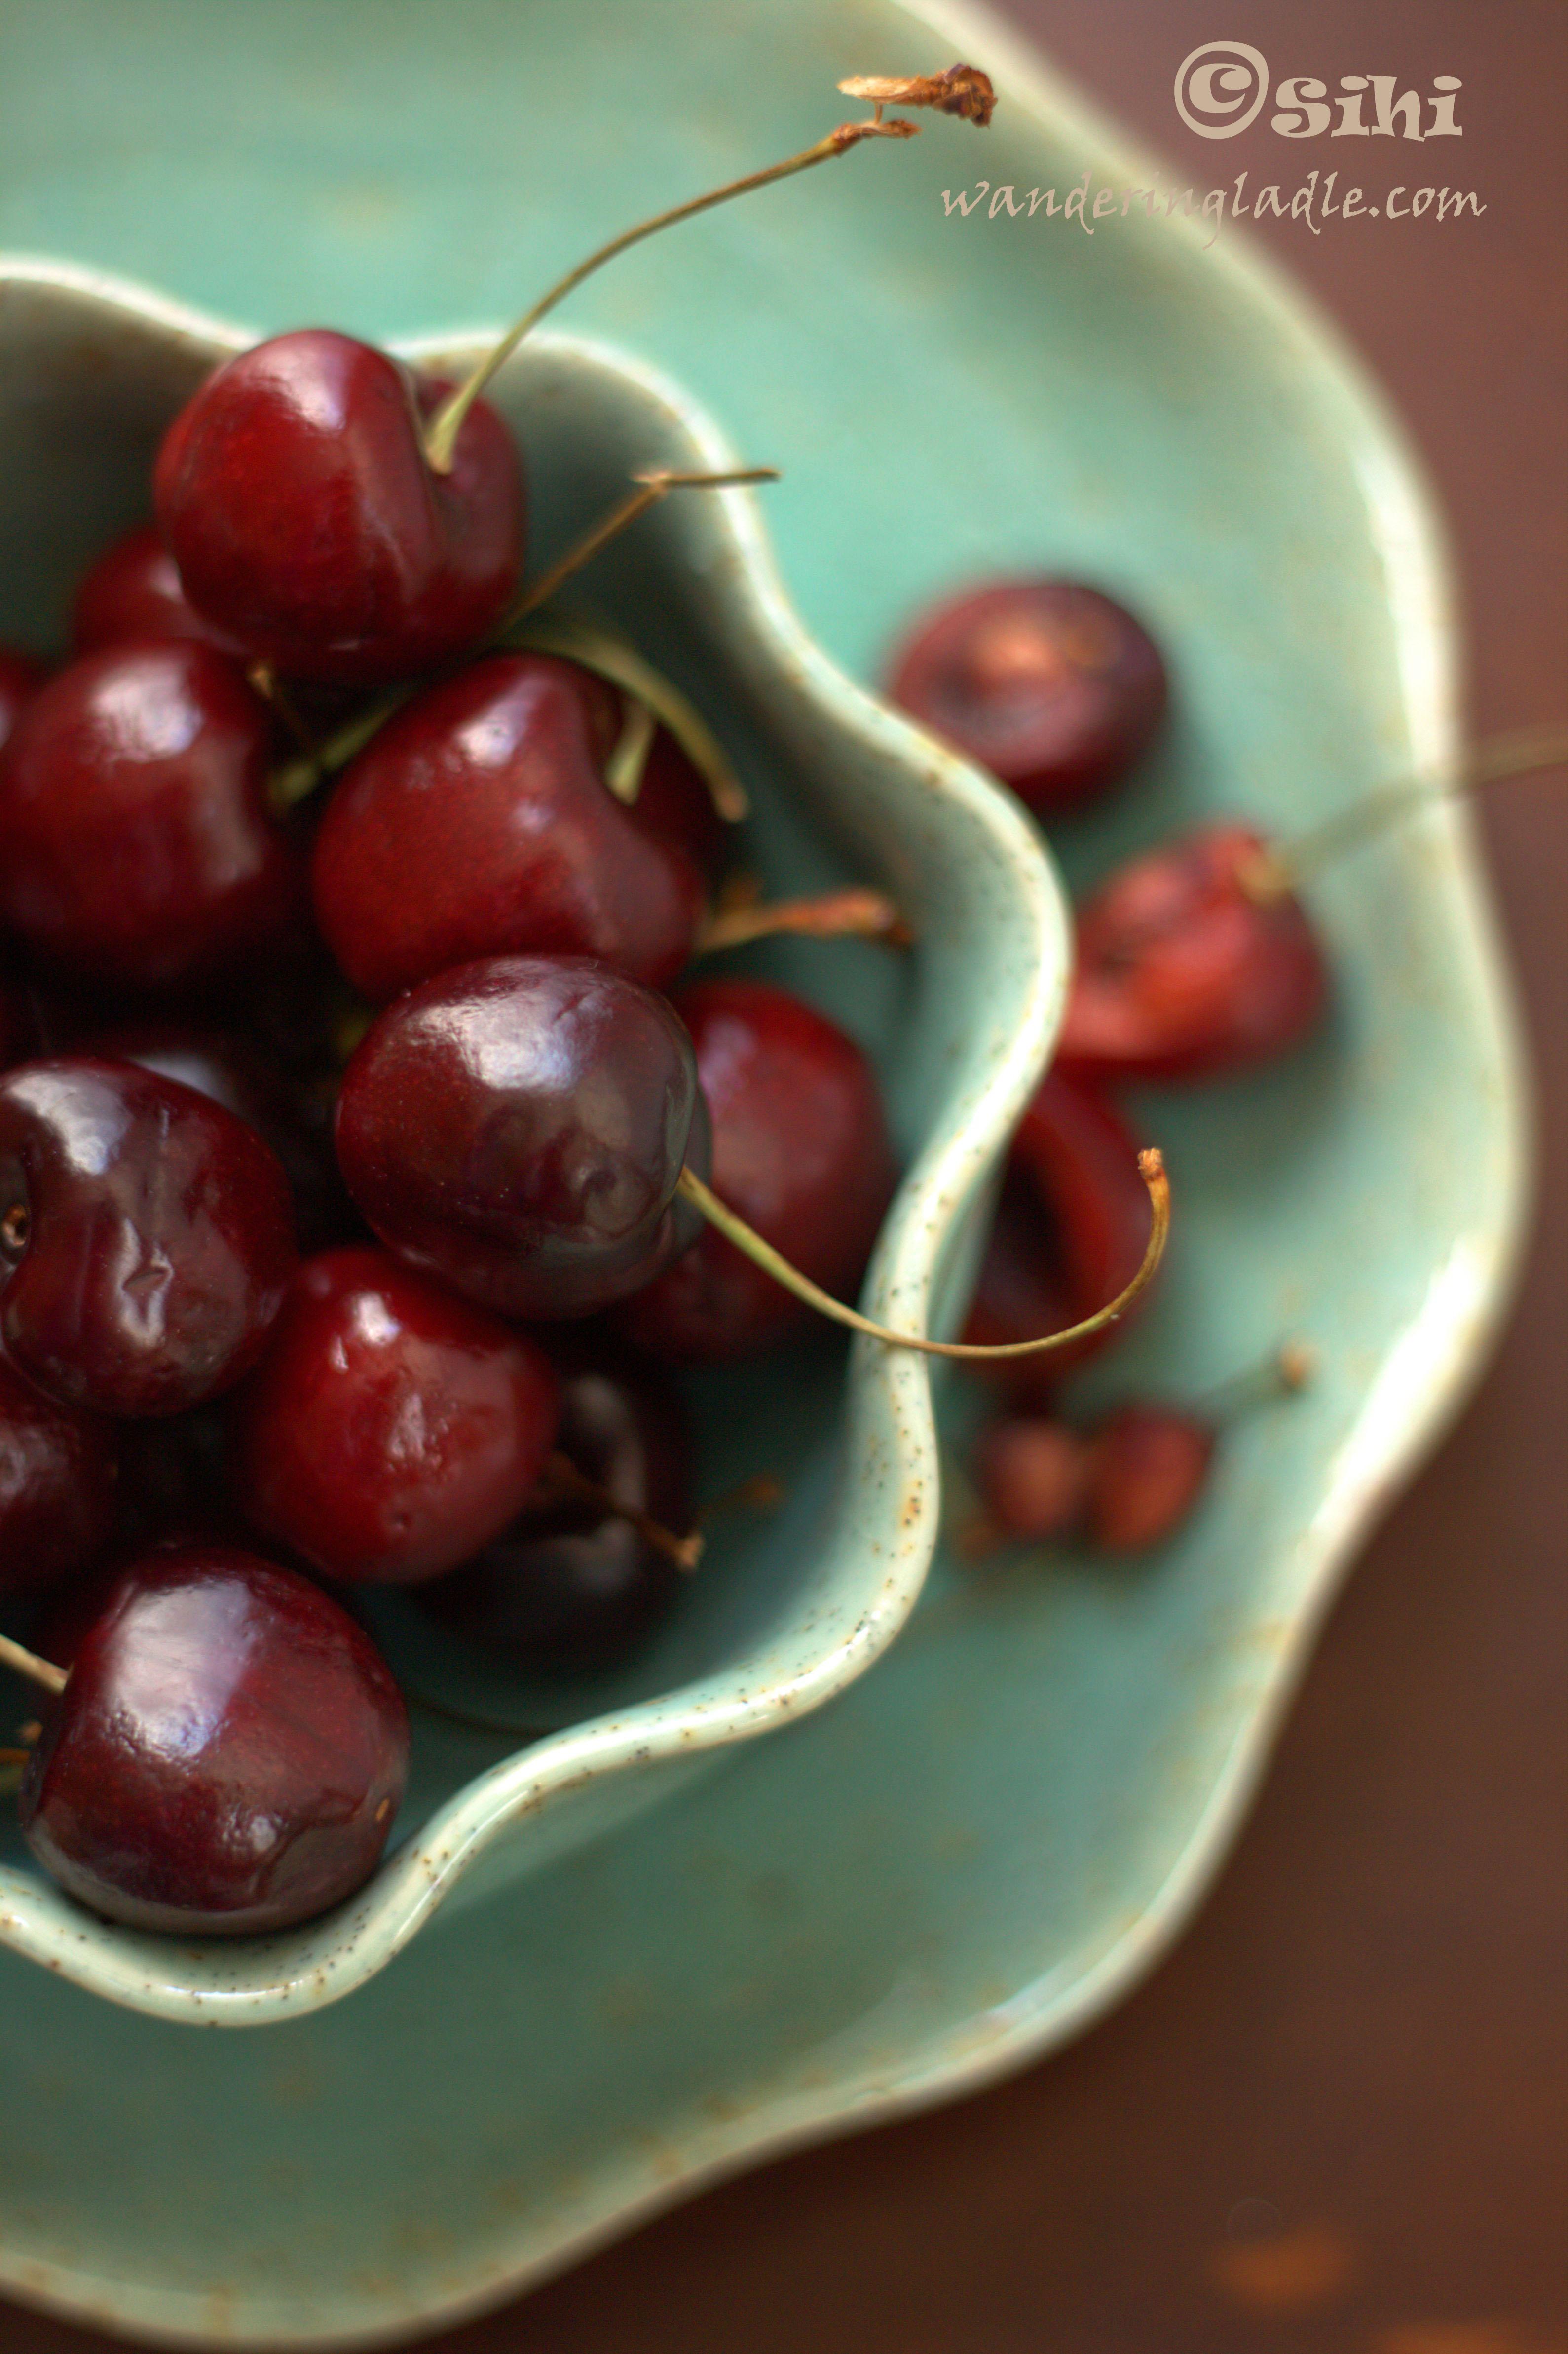 cherries_sihi_wl-copy